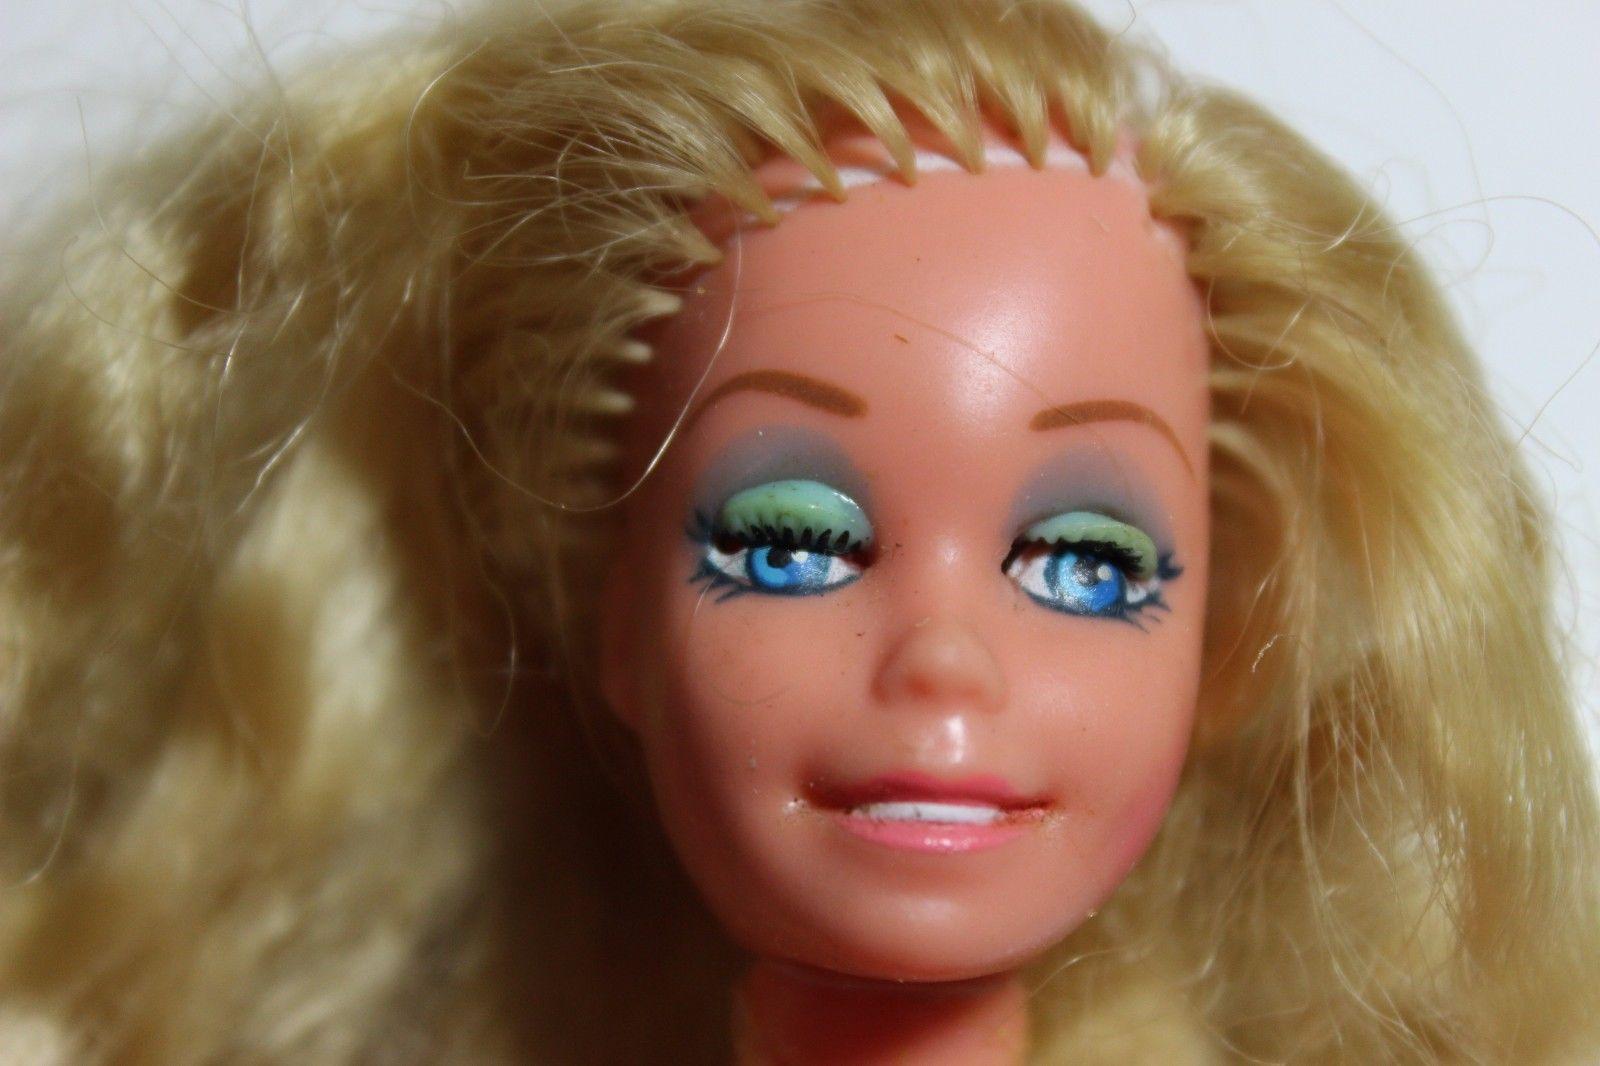 Vintage Barbie Doll country western Mattel Mod Blonde hair Winking Barbie Read - $14.24